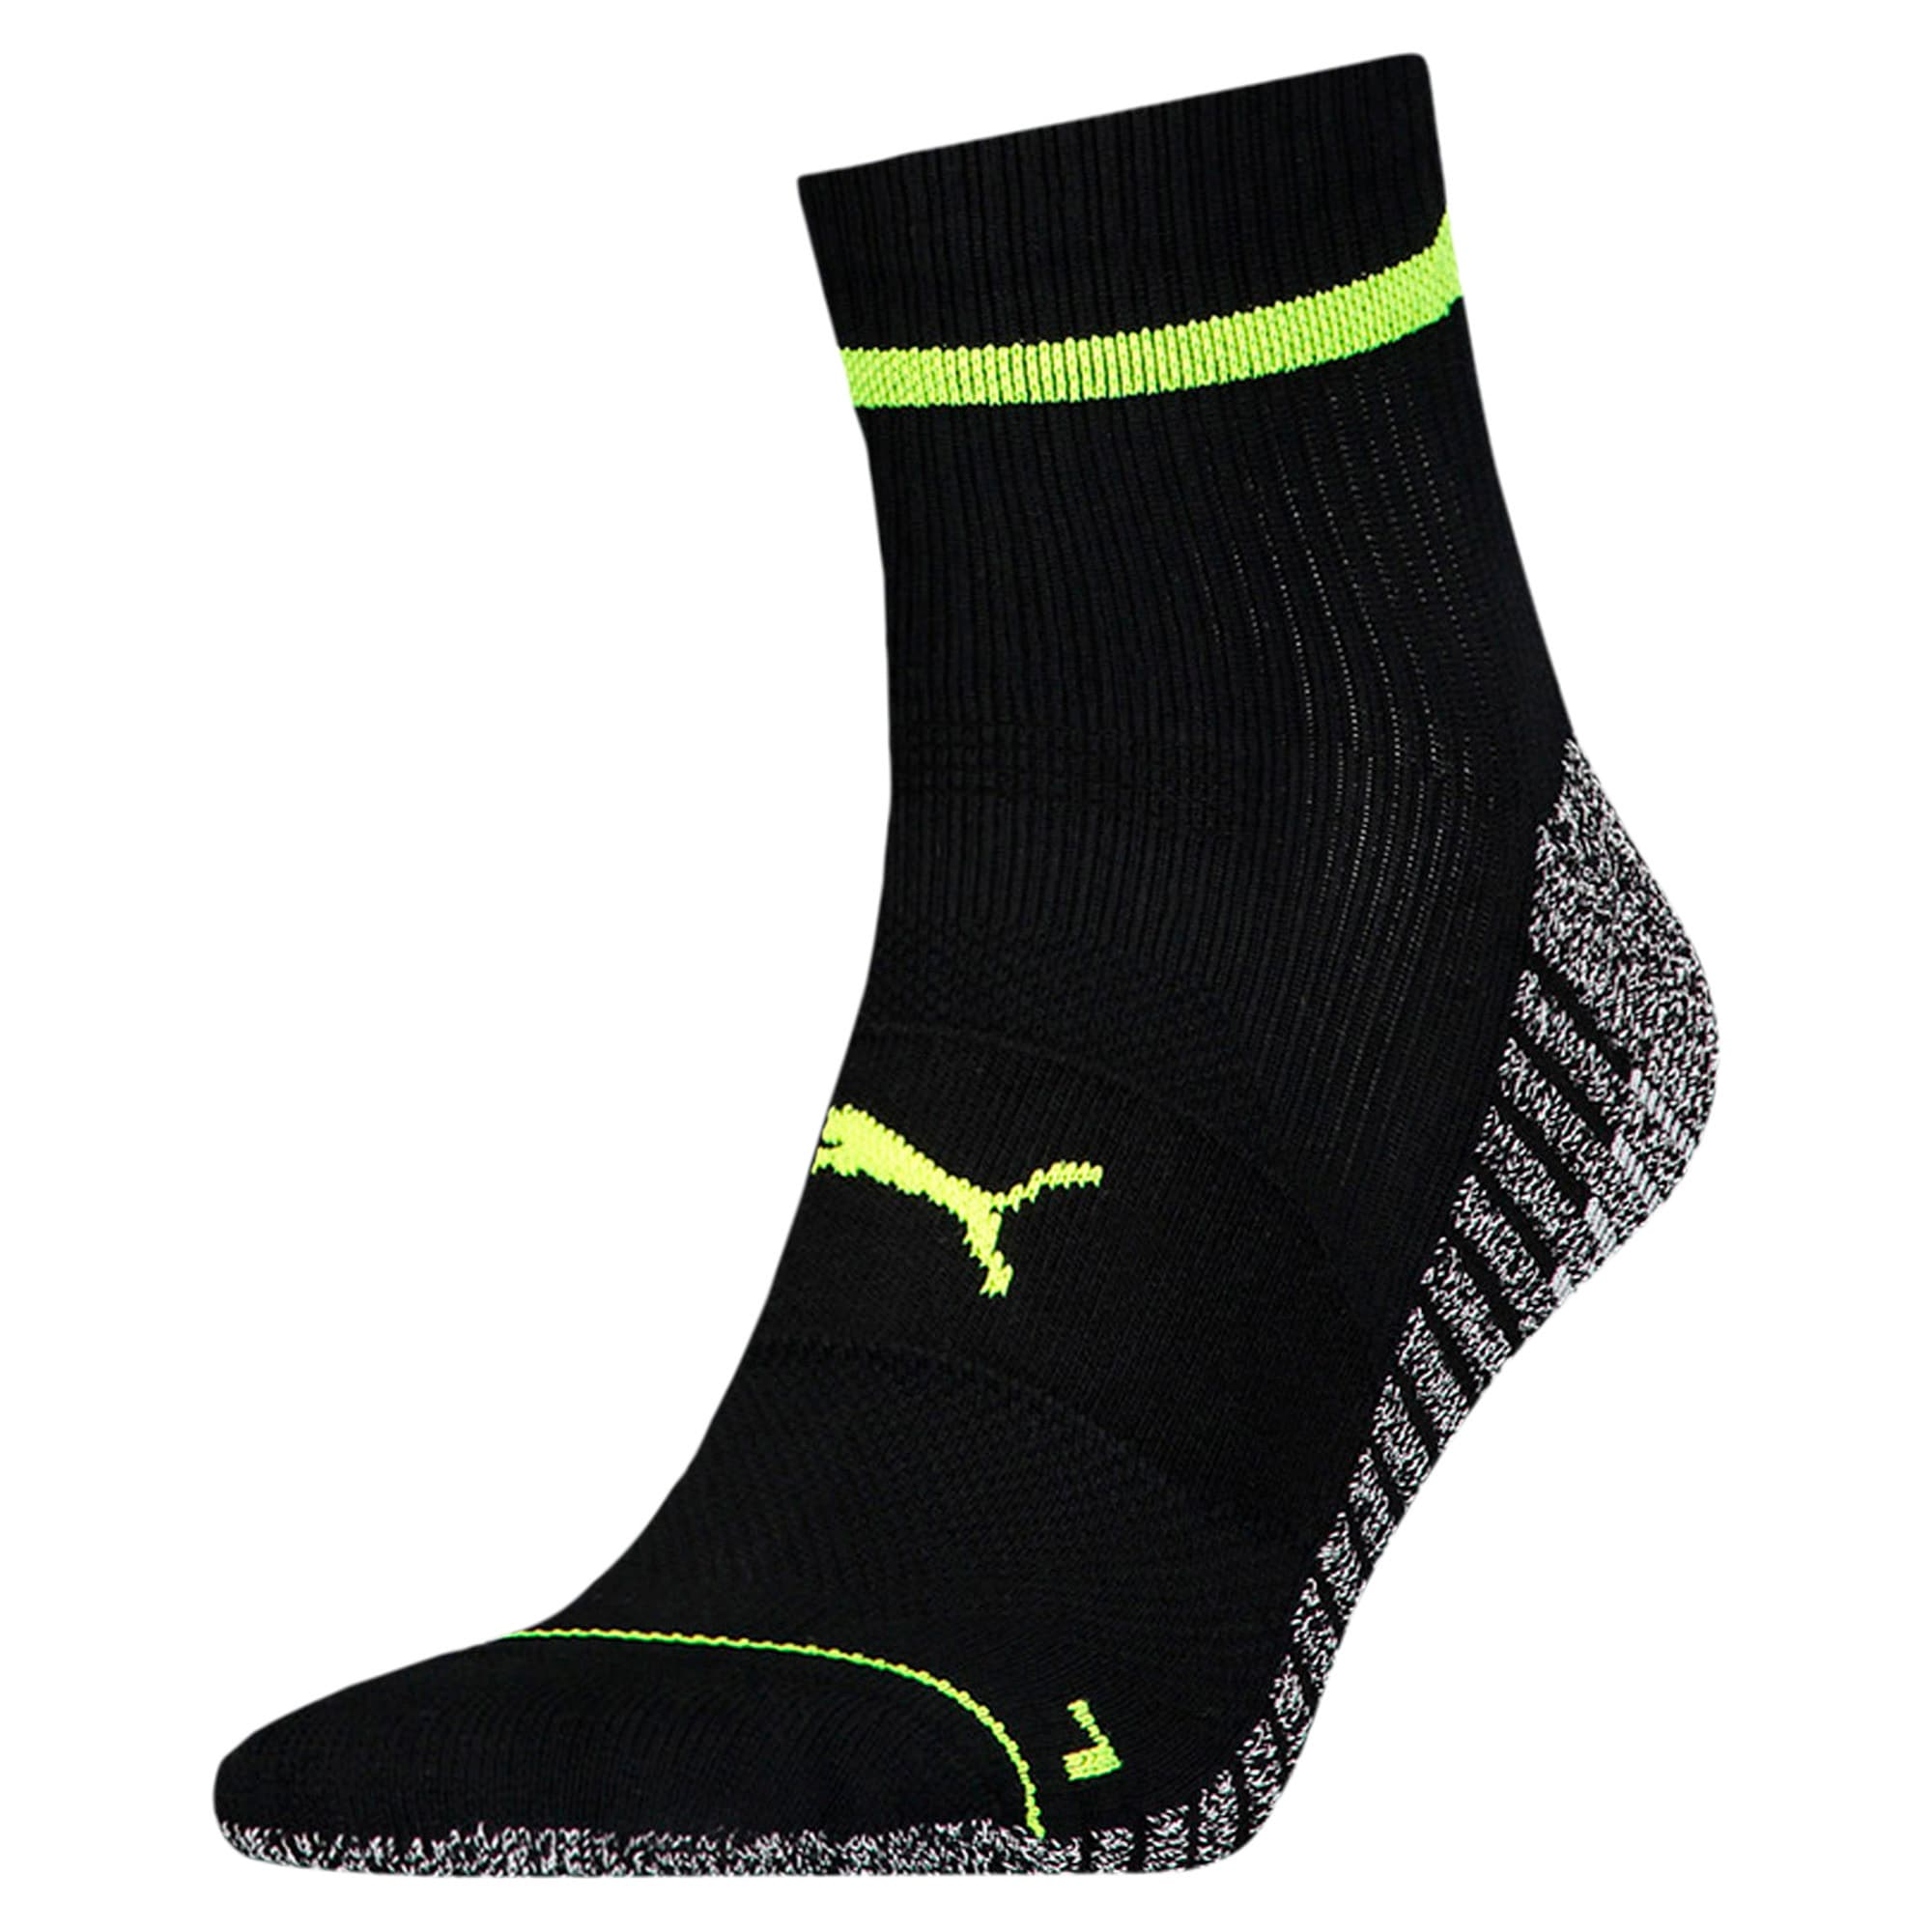 Thumbnail 1 of Performance Traction Socks, black, medium